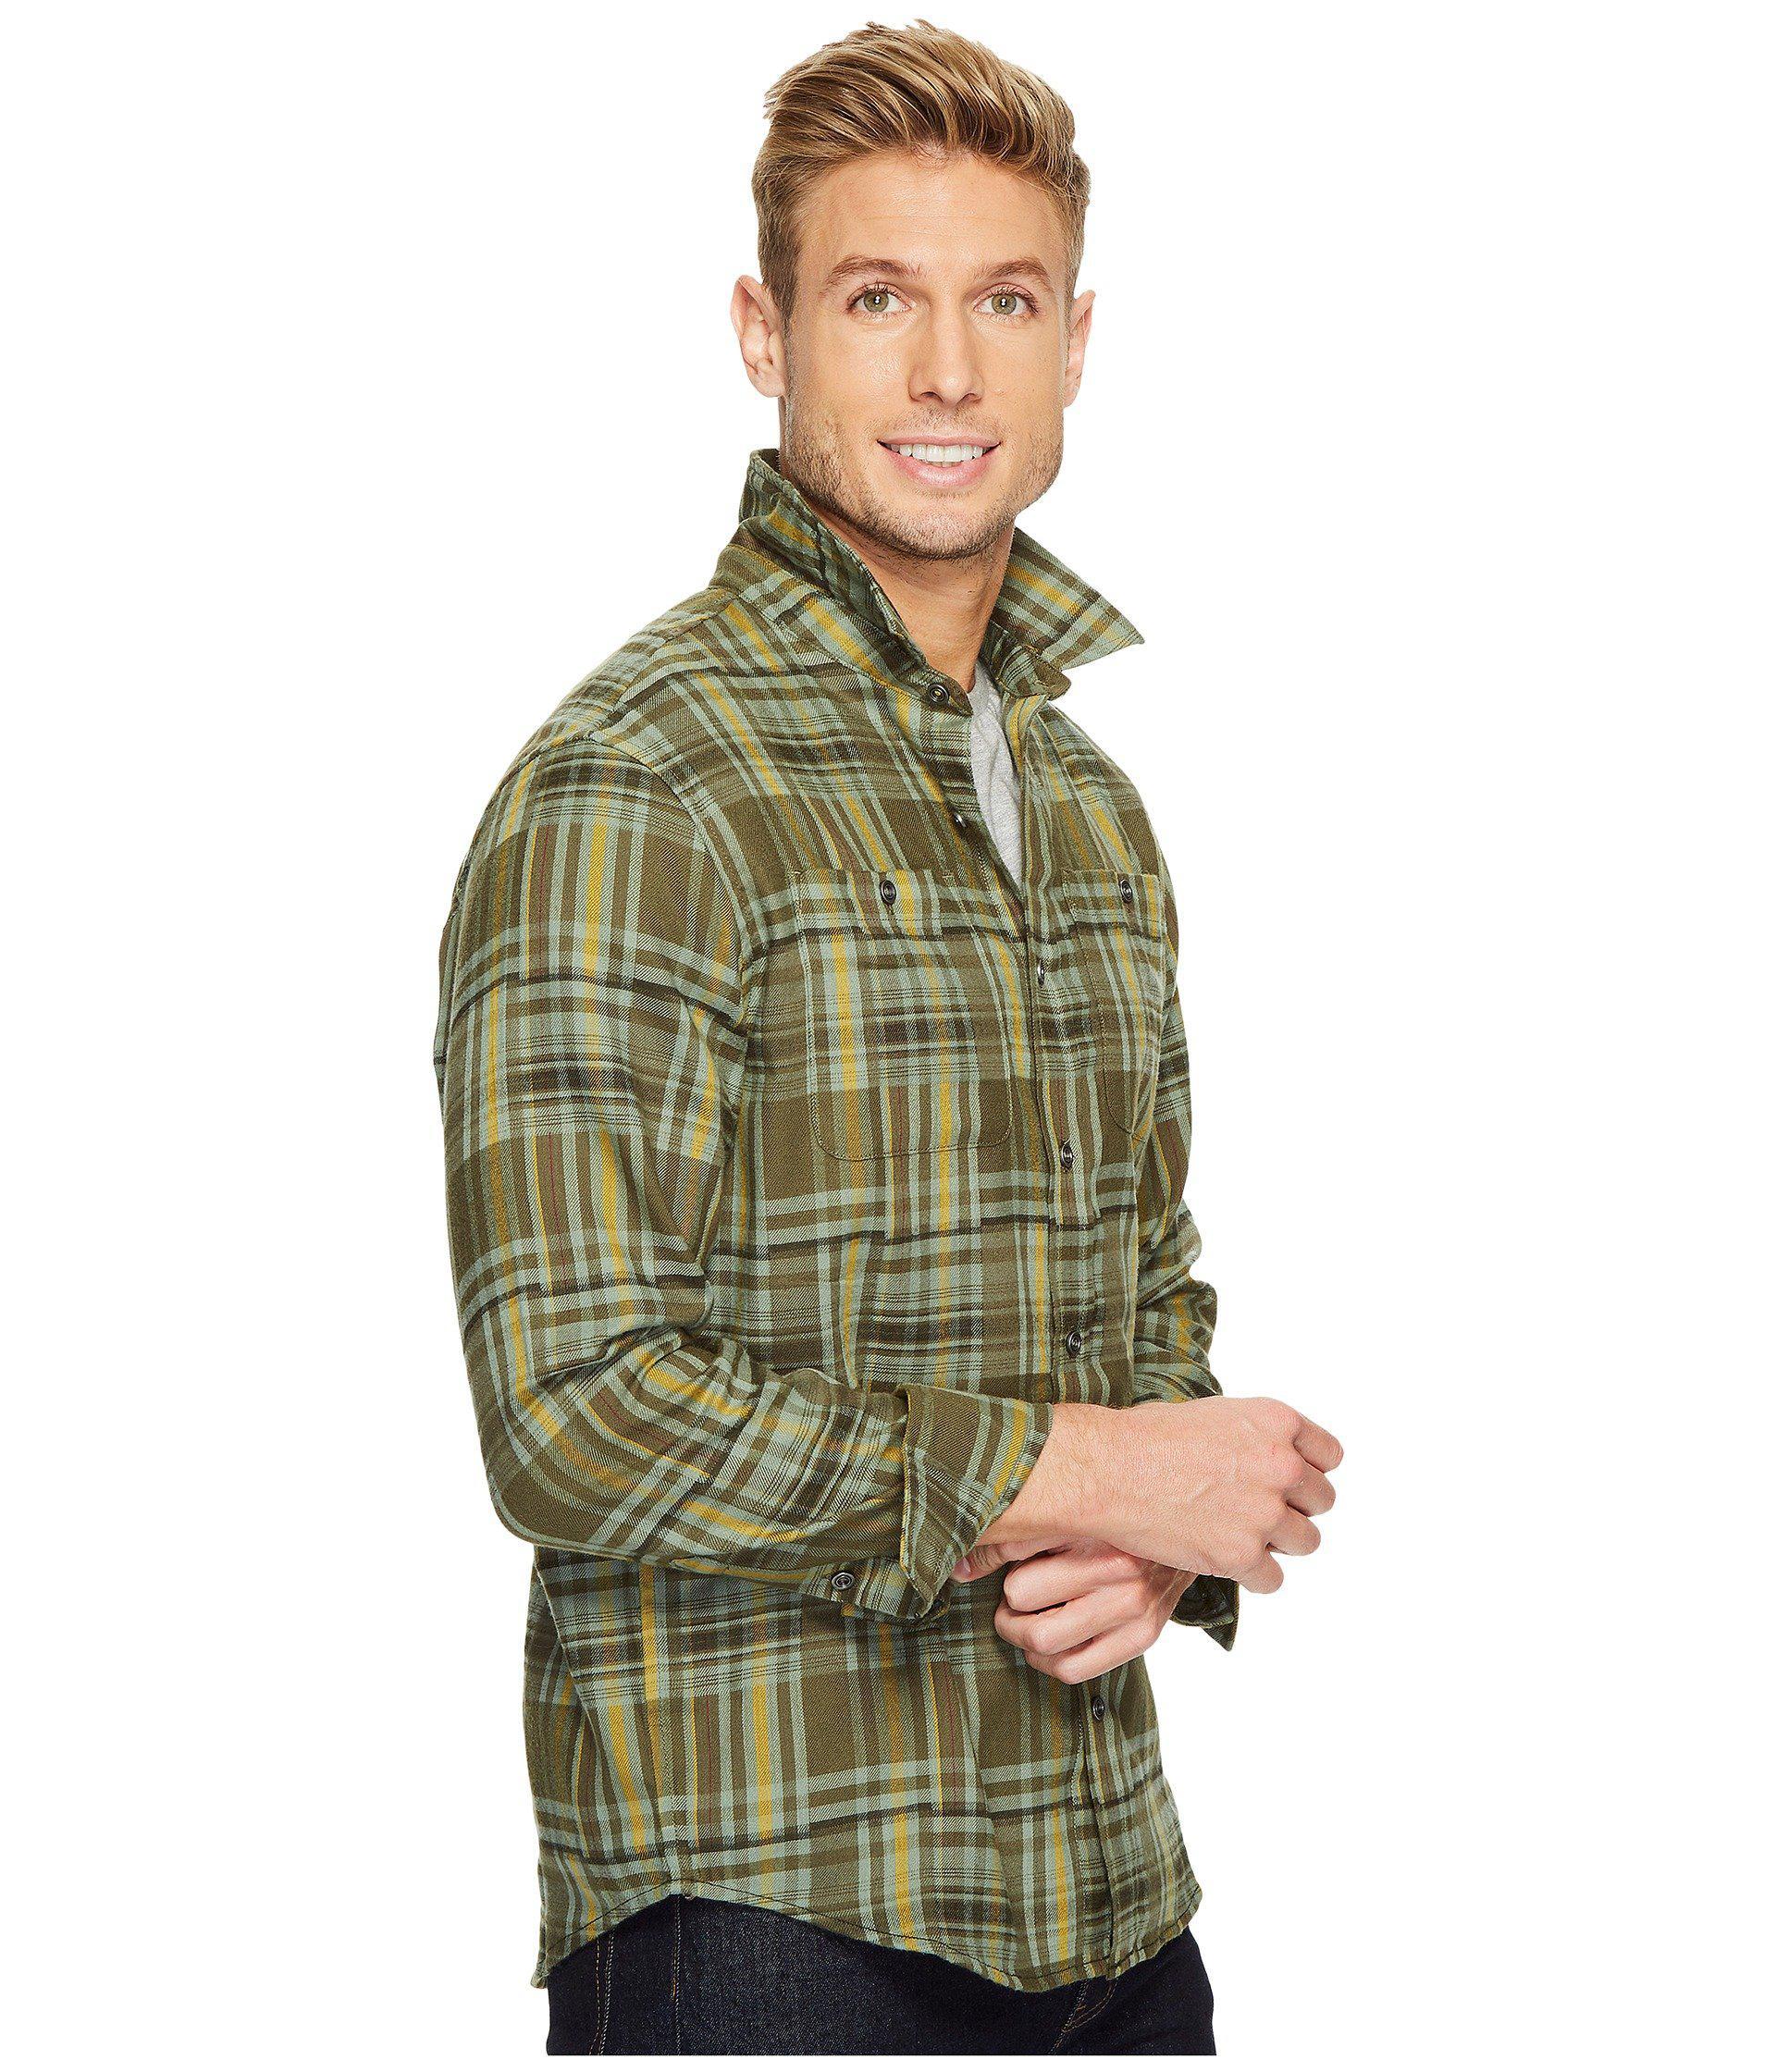 Lyst Prana Stratford Long Sleeve Shirt In Green For Men Save 125